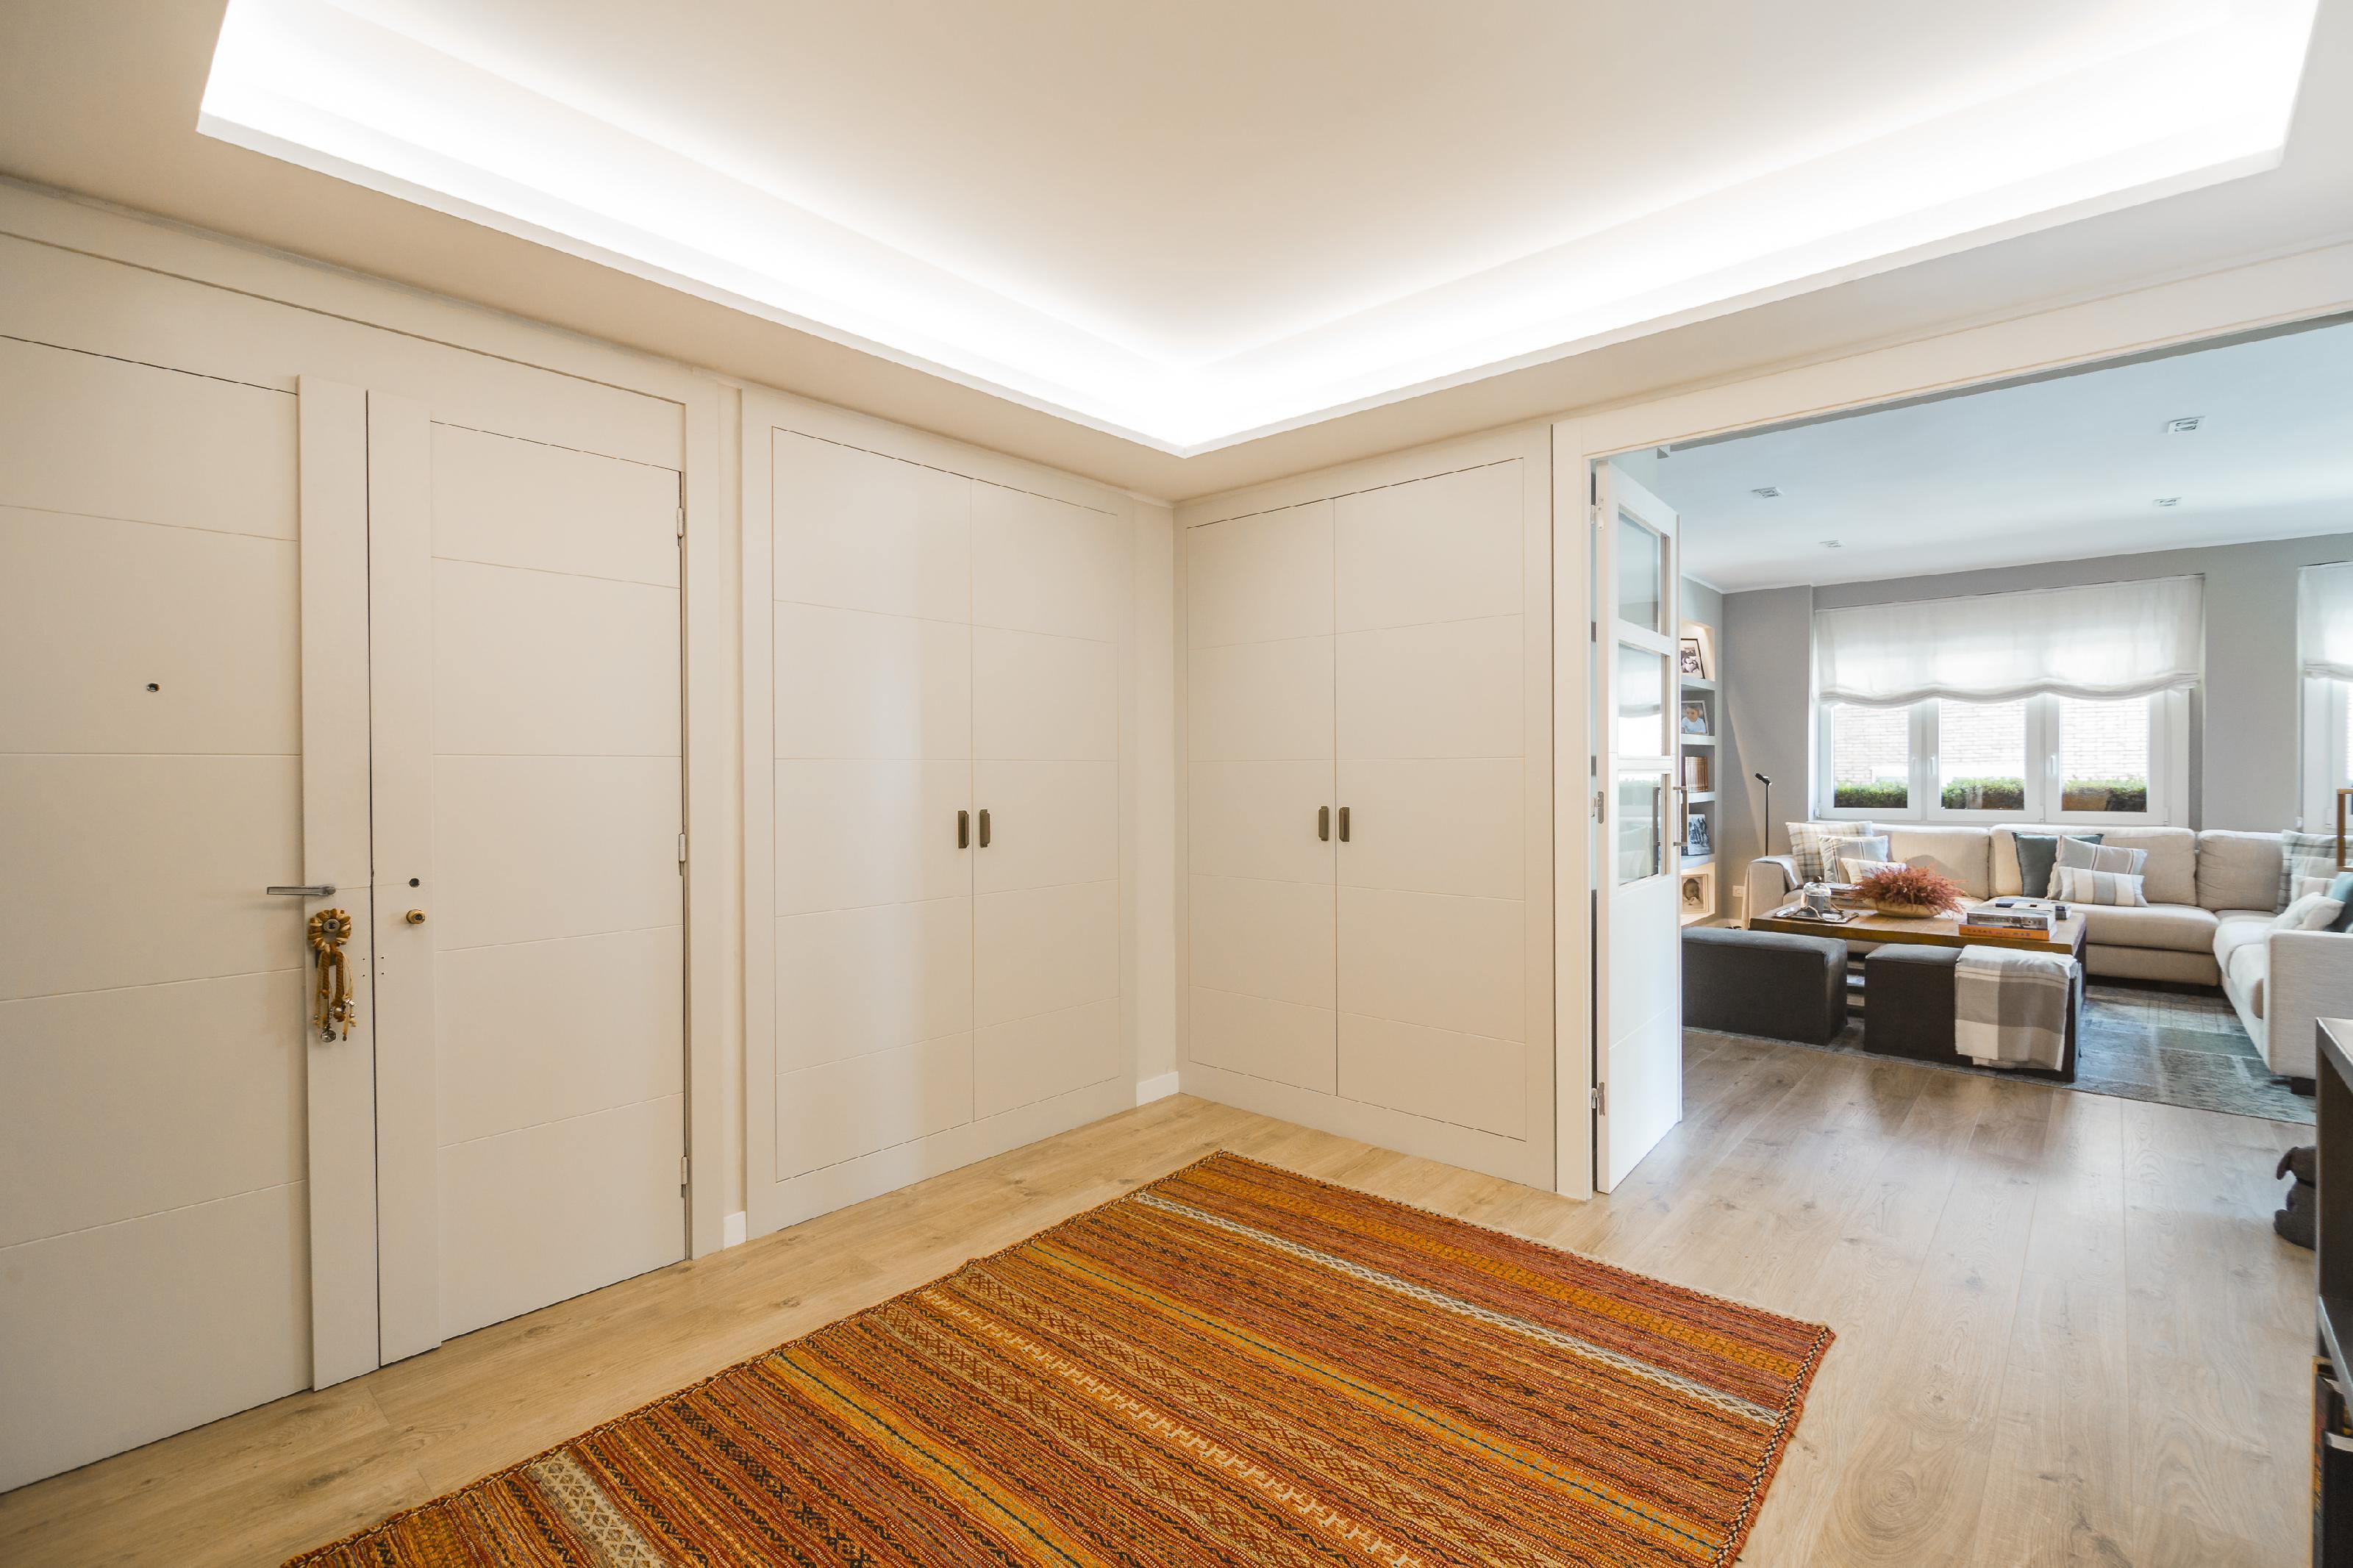 244392 Flat for sale in Sarrià-Sant Gervasi, Sant Gervasi-Galvany 13